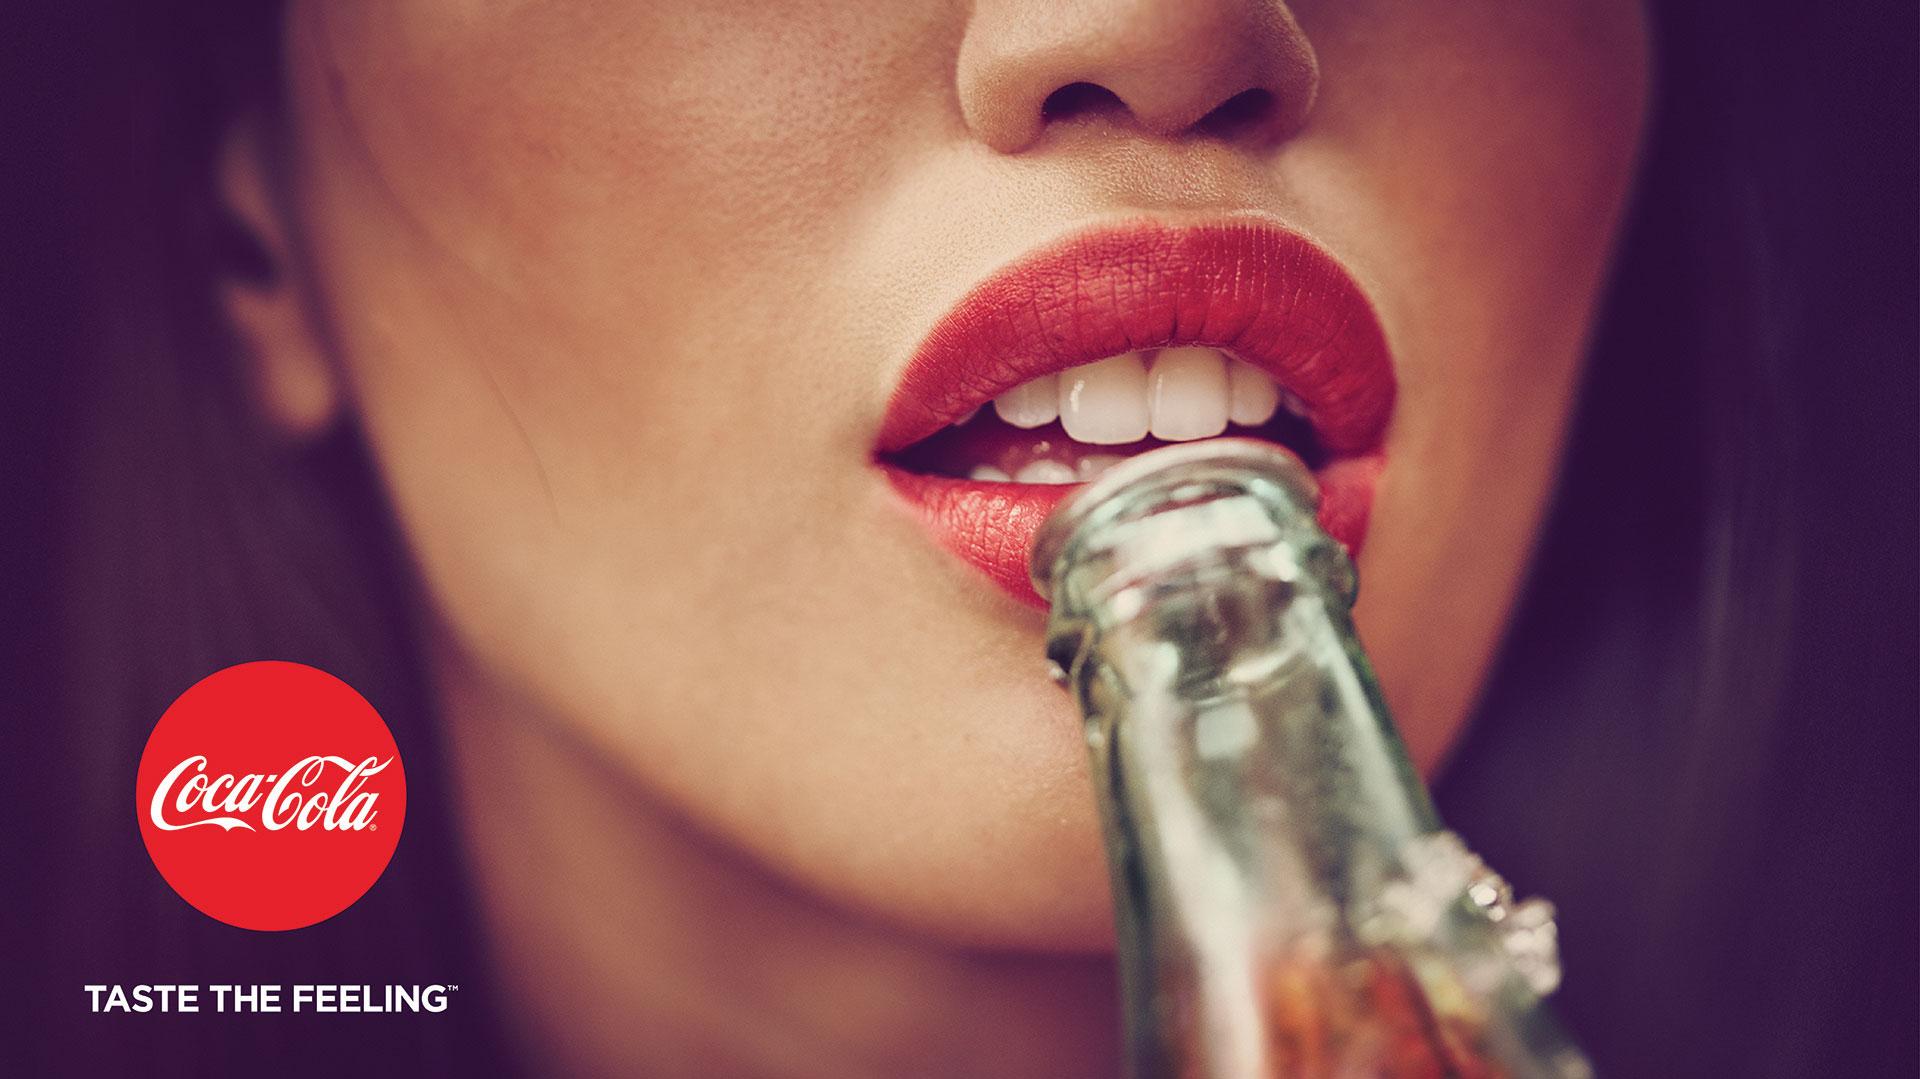 charles i. letbetter - Coke goes all in